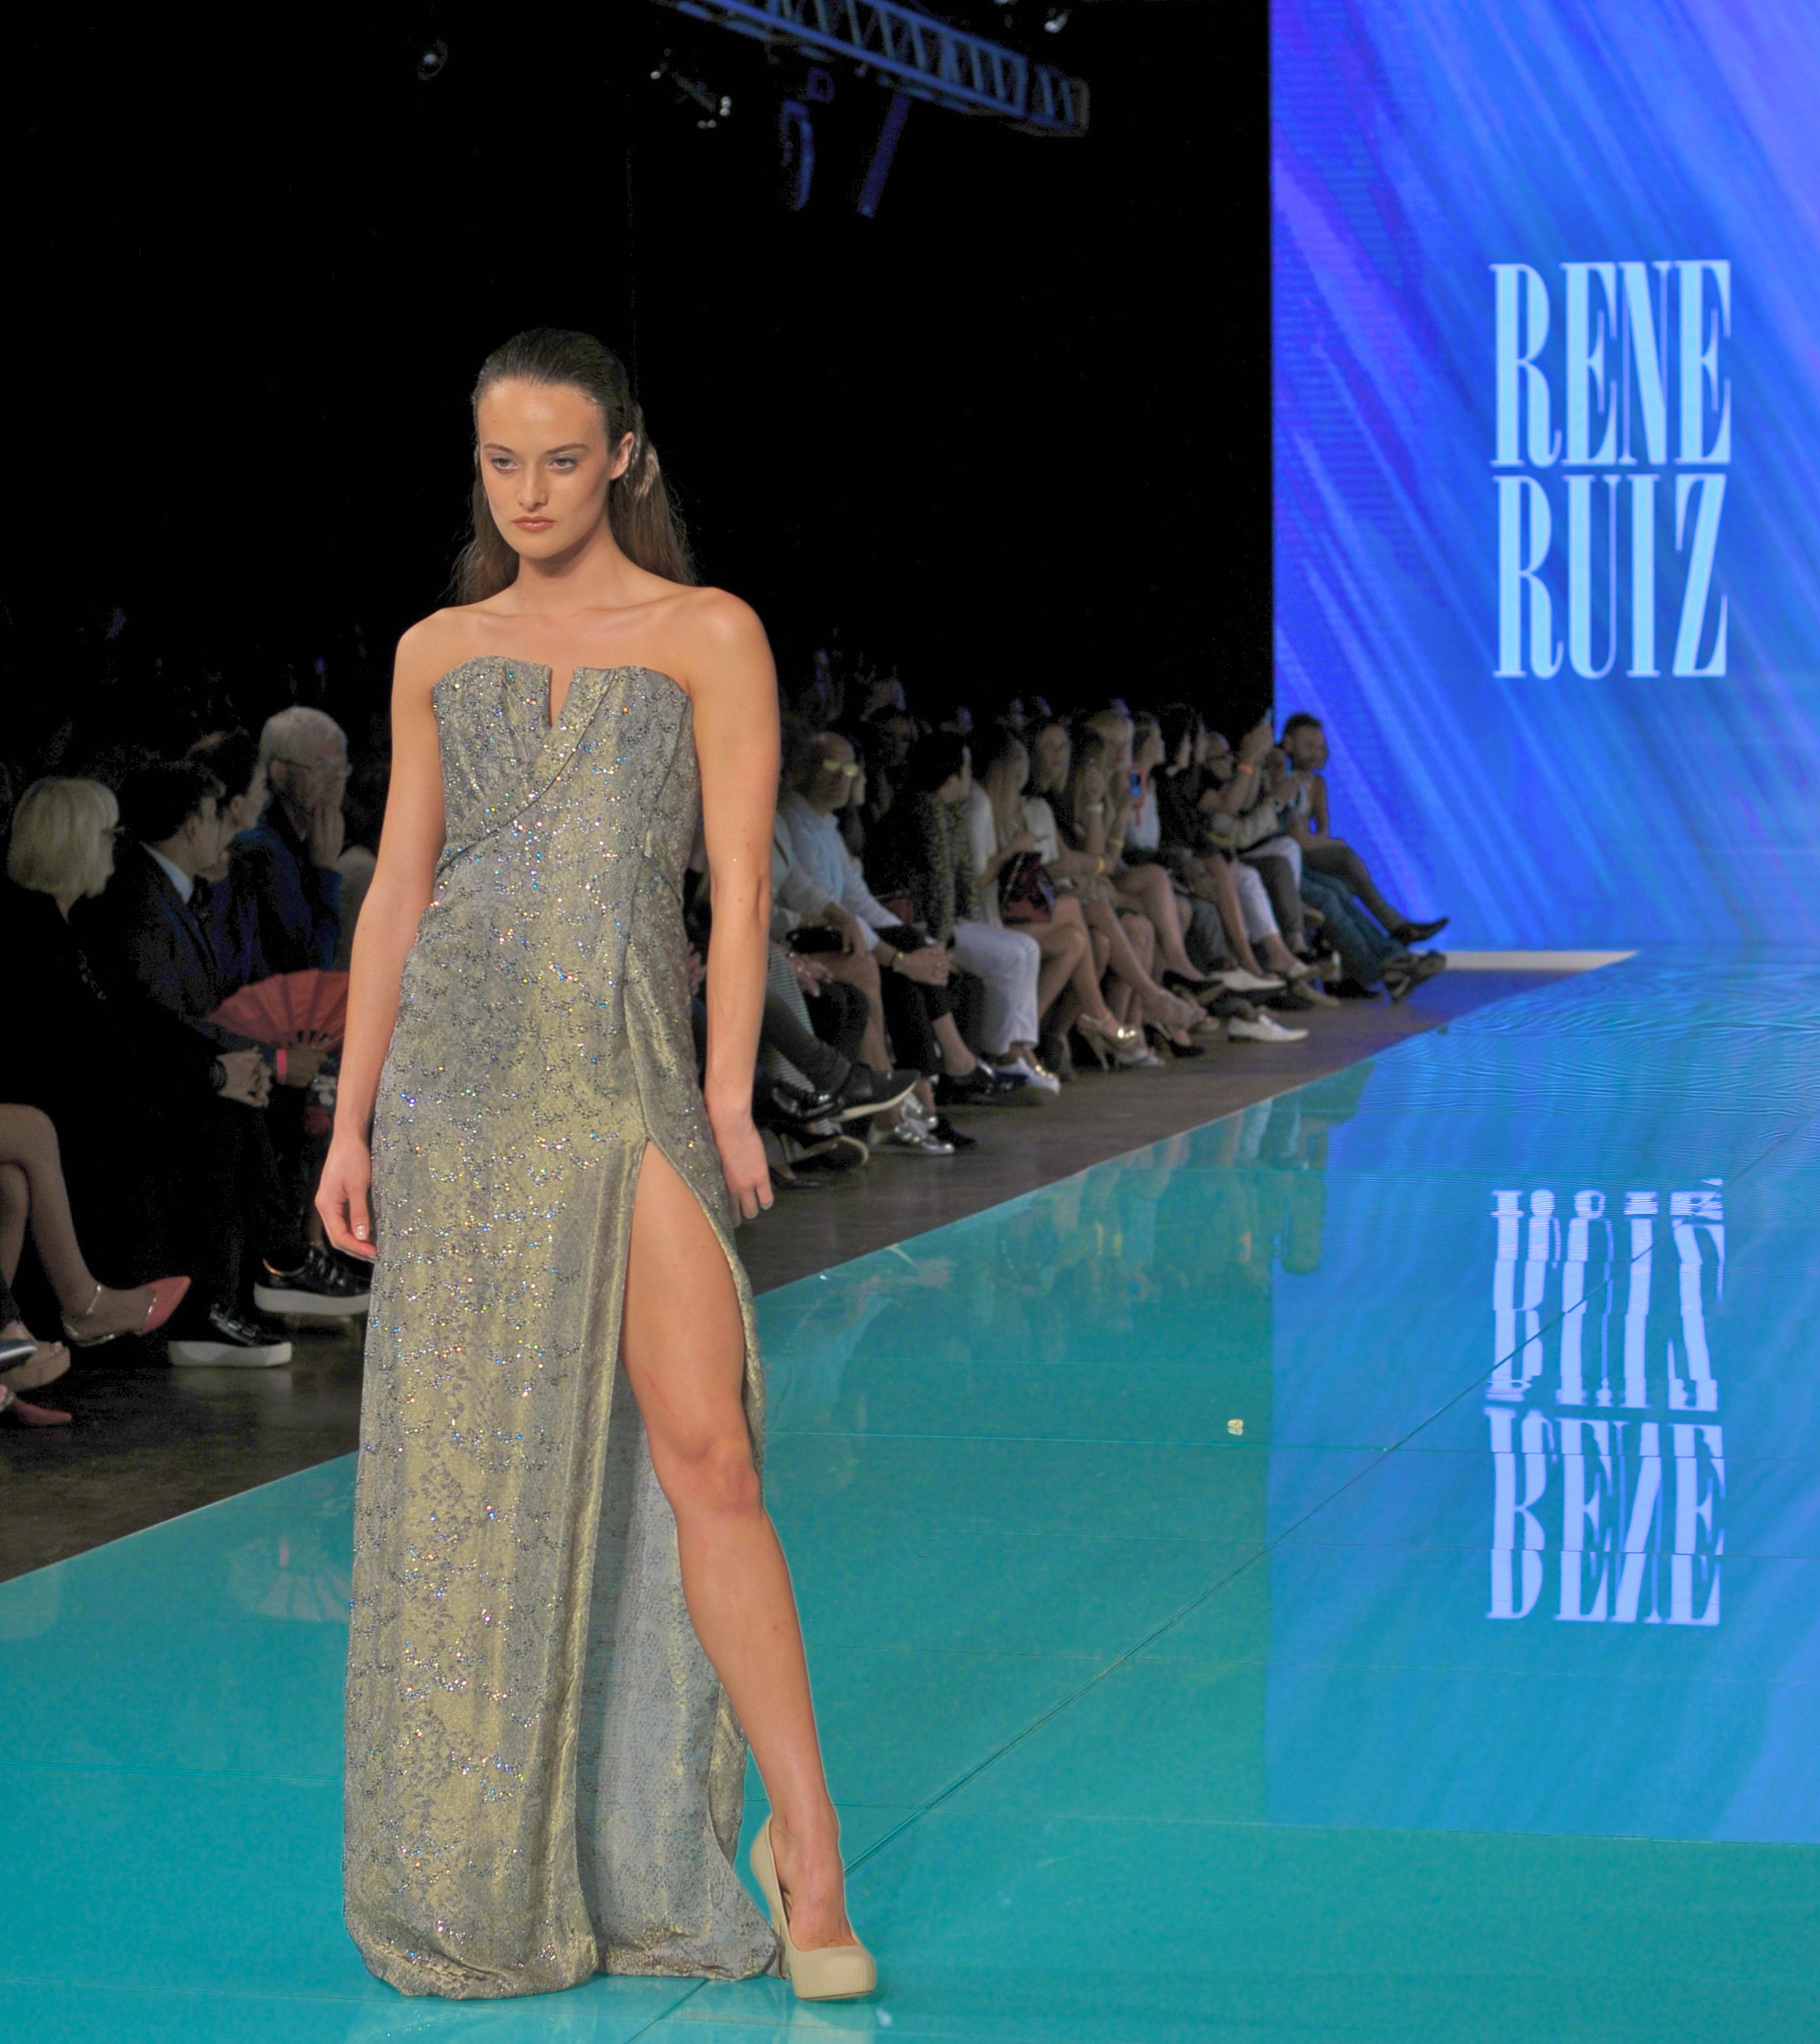 Rene Ruiz Miami Fashion Week 2016 - 13